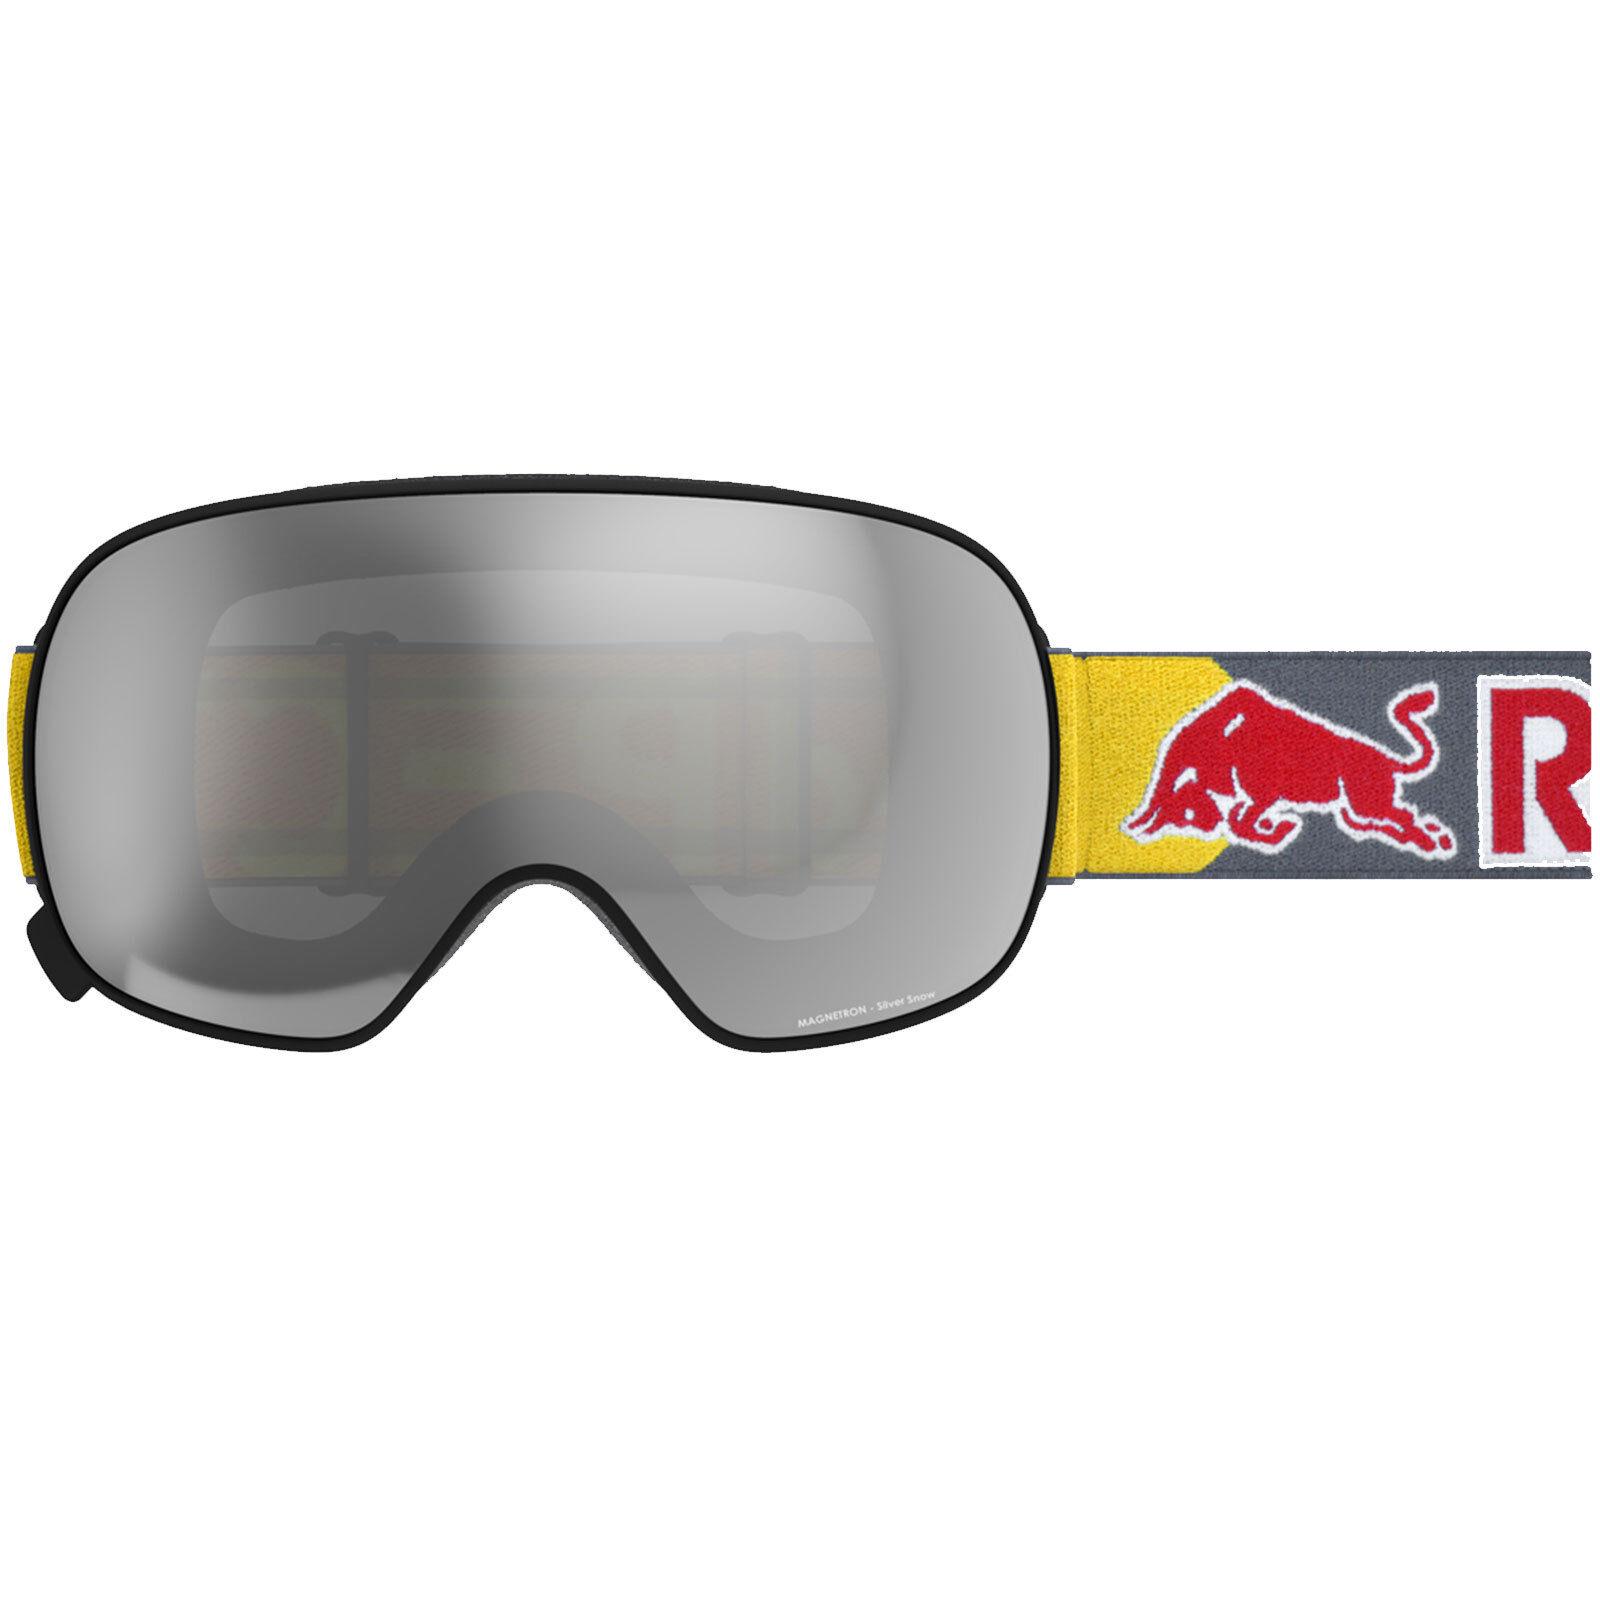 Spect Eyewear rot Bull Magnetron Goggle Schneebrille Skibrille Snowboardbrille Snowboardbrille Snowboardbrille 0cd002